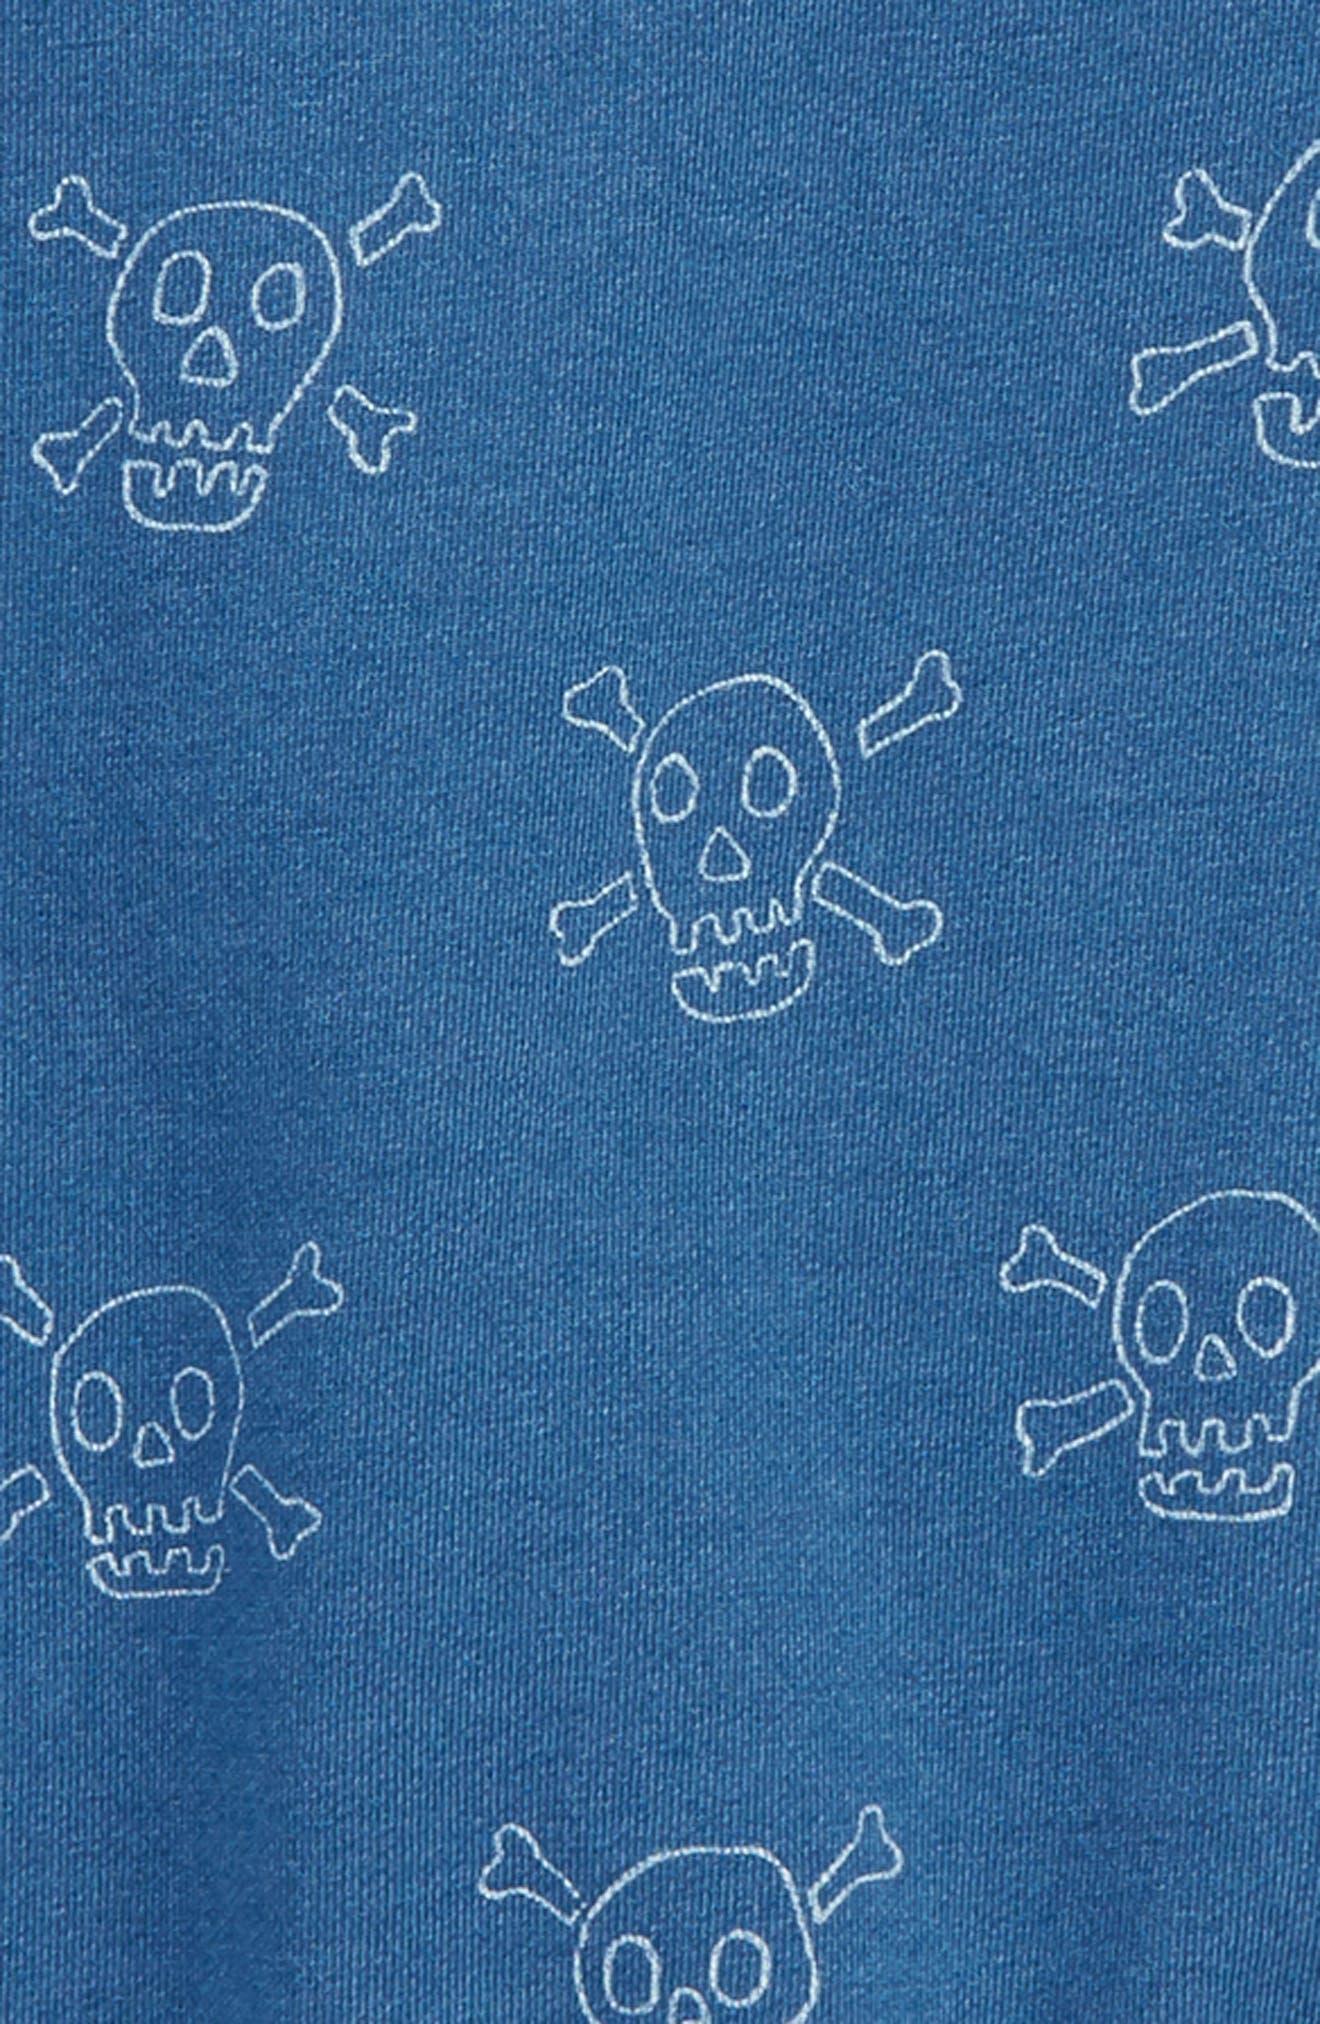 Castaway Skulls Sweatshirt,                             Alternate thumbnail 2, color,                             424